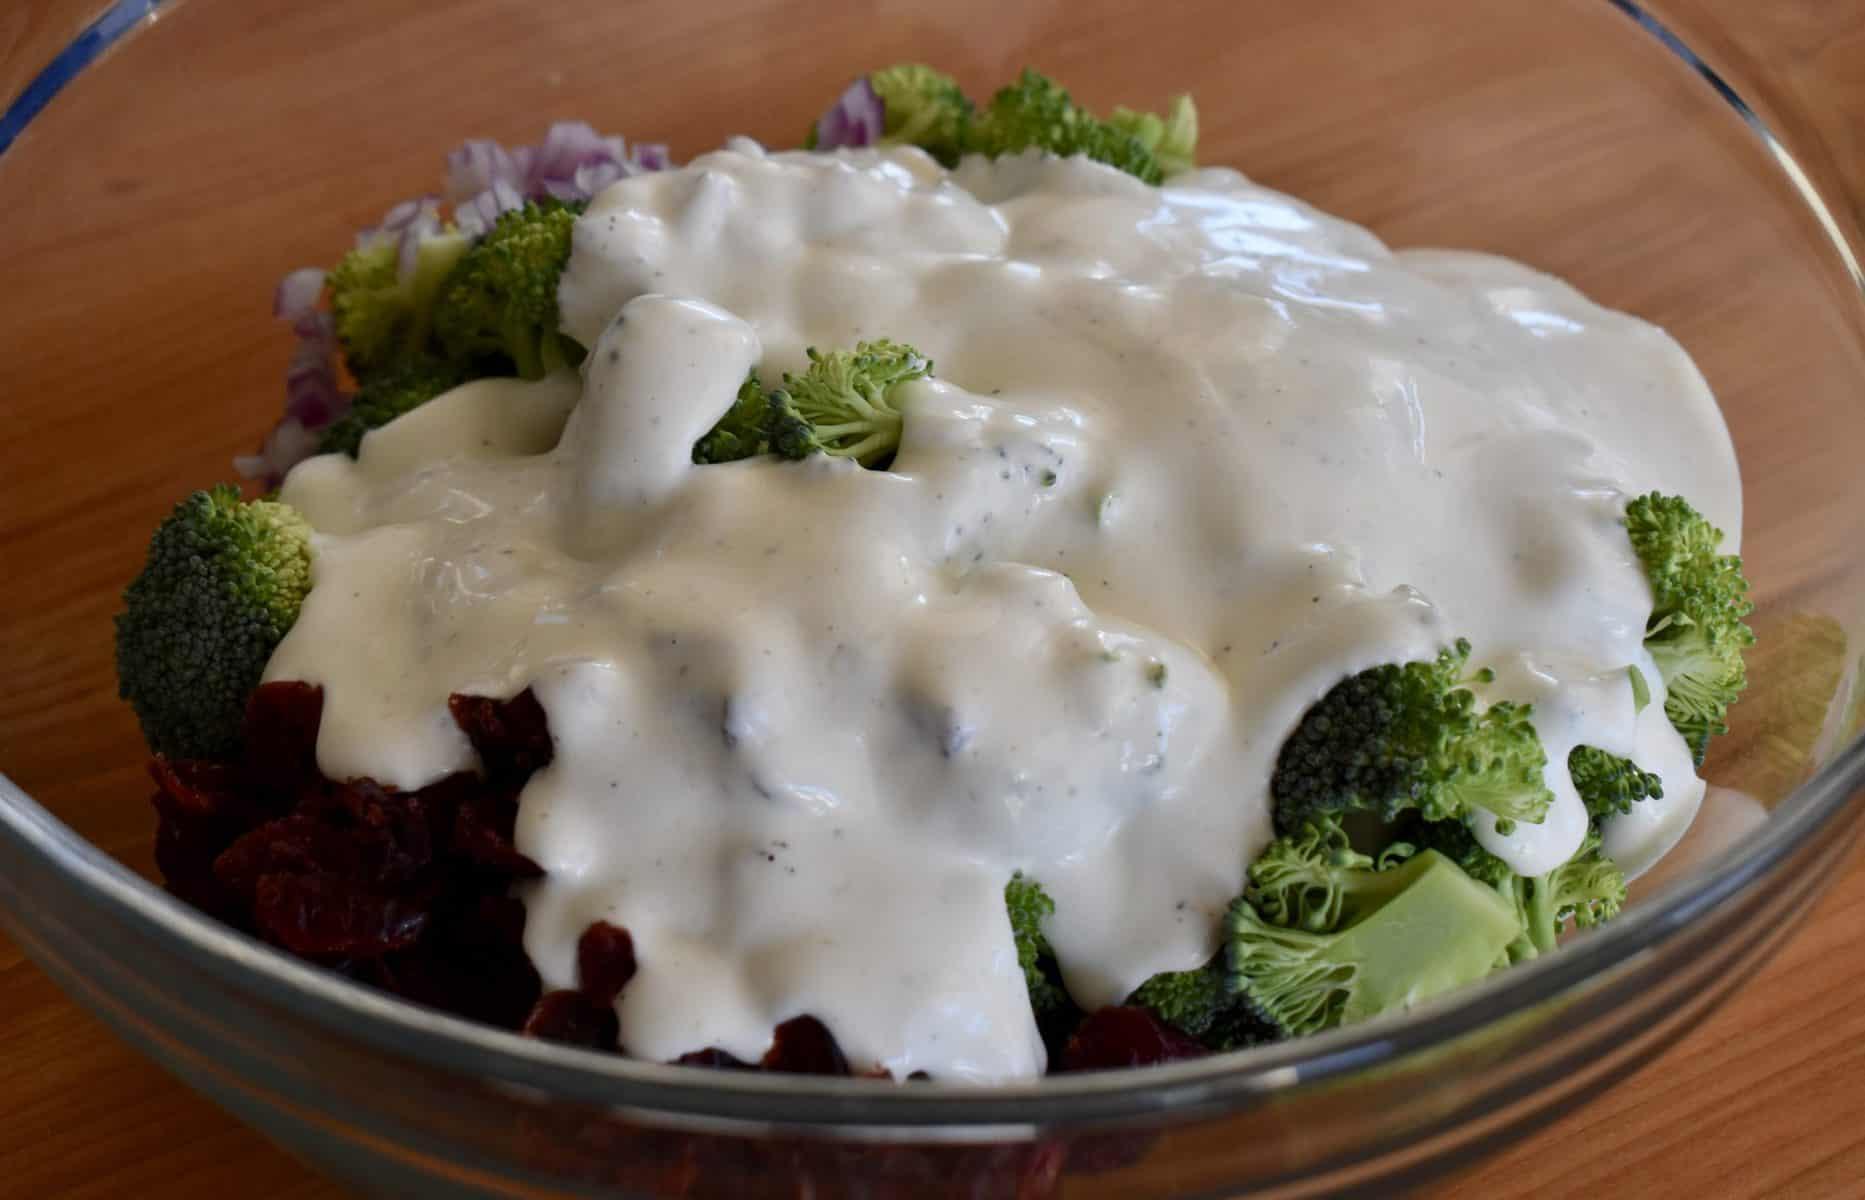 greek yogurt dressing poured over broccoli cranberry salad in a large glass bowl.